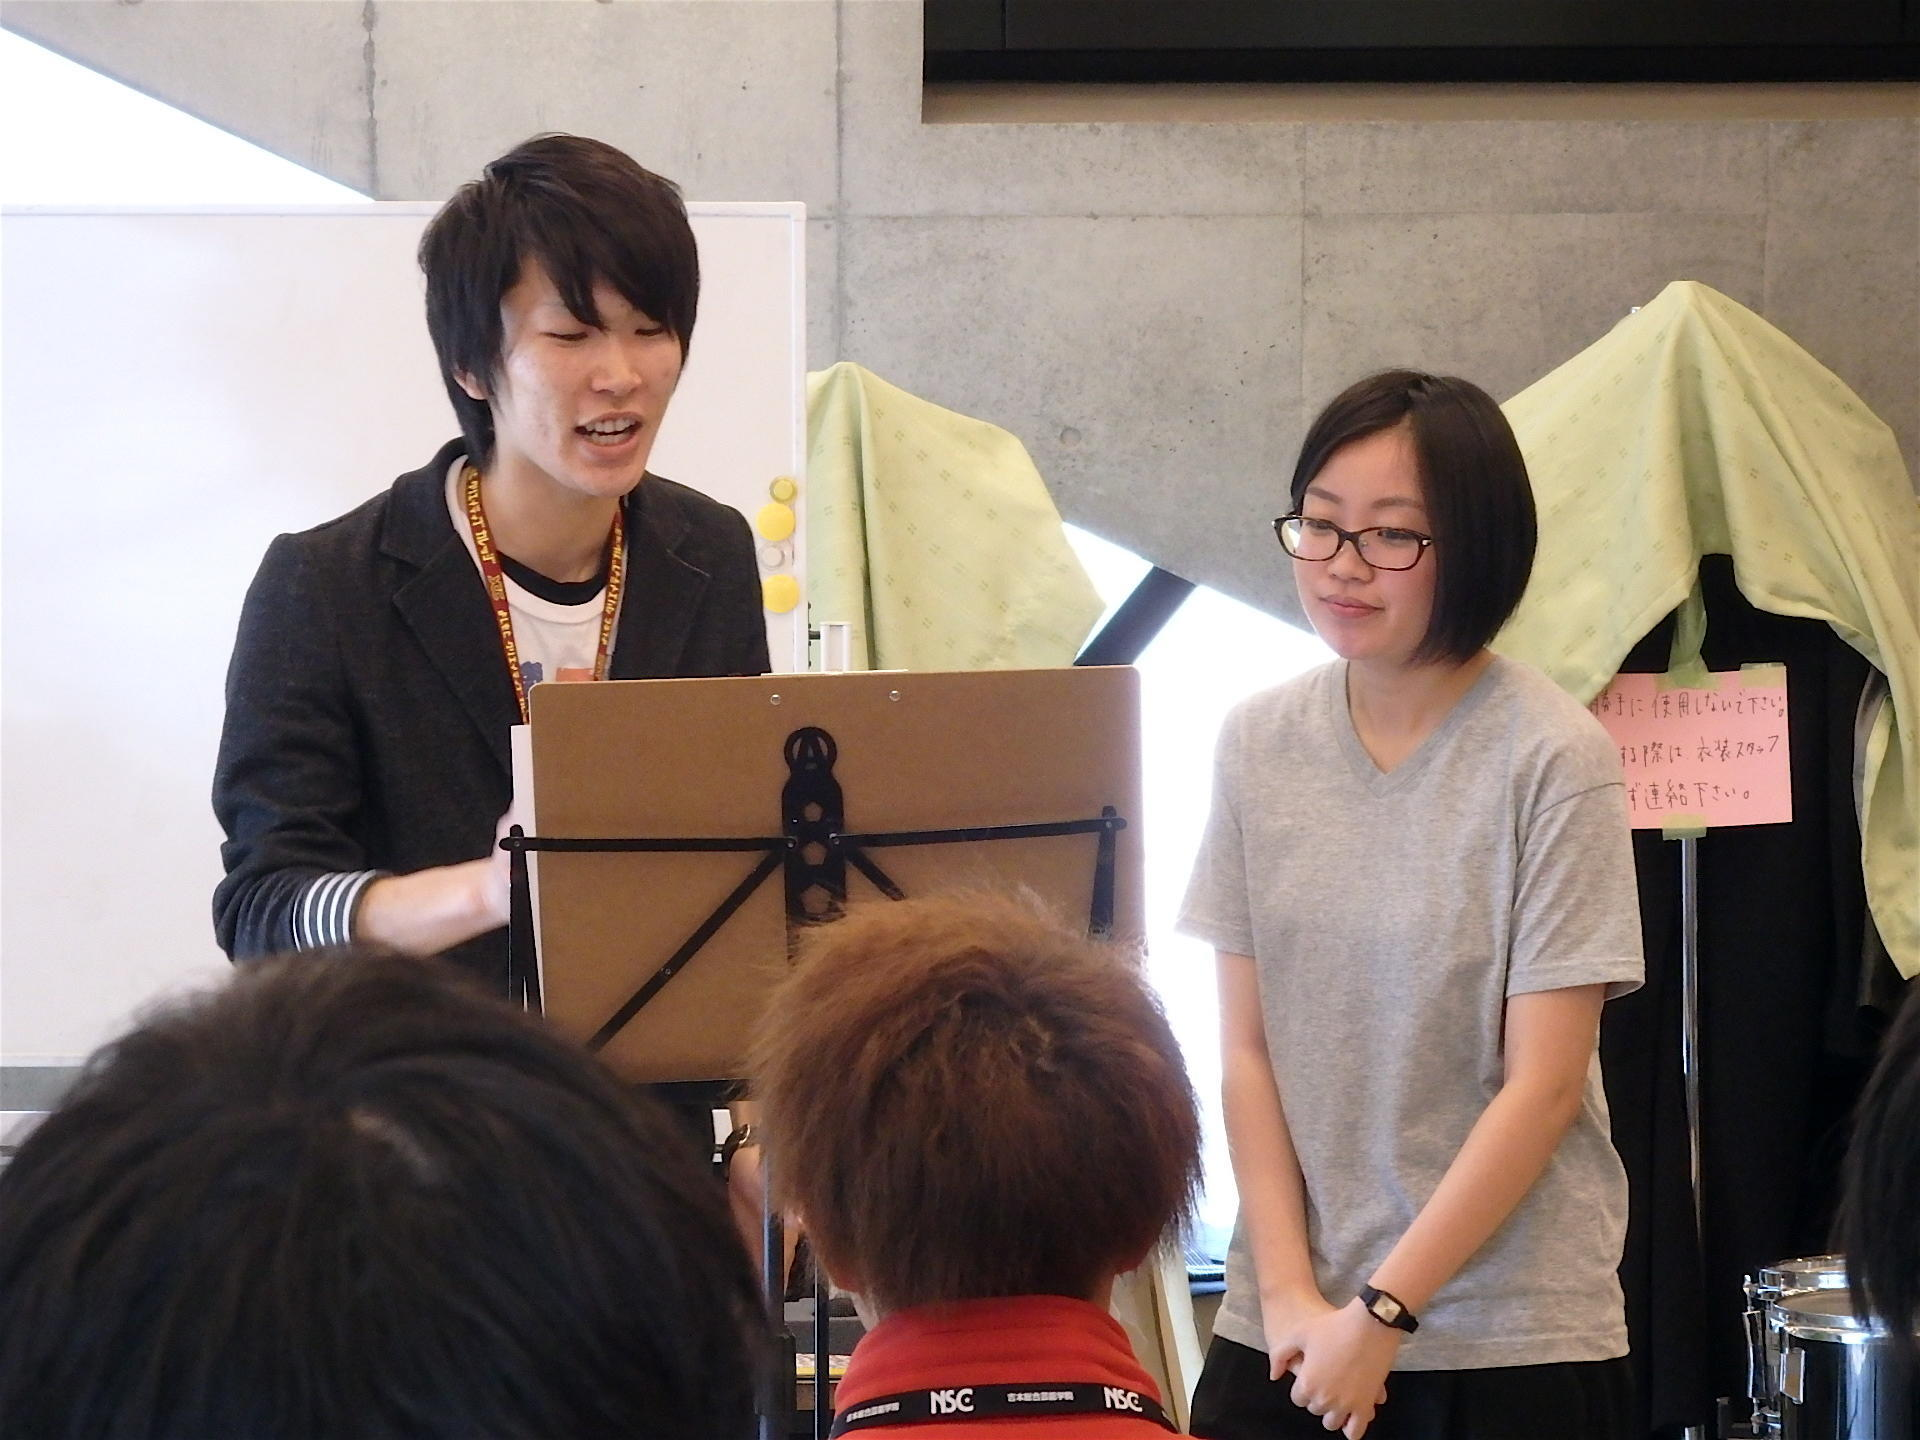 http://news.yoshimoto.co.jp/20160501000300-3d70a3697ade5d47b94fc708fcaf1a9d9f2973cc.jpg